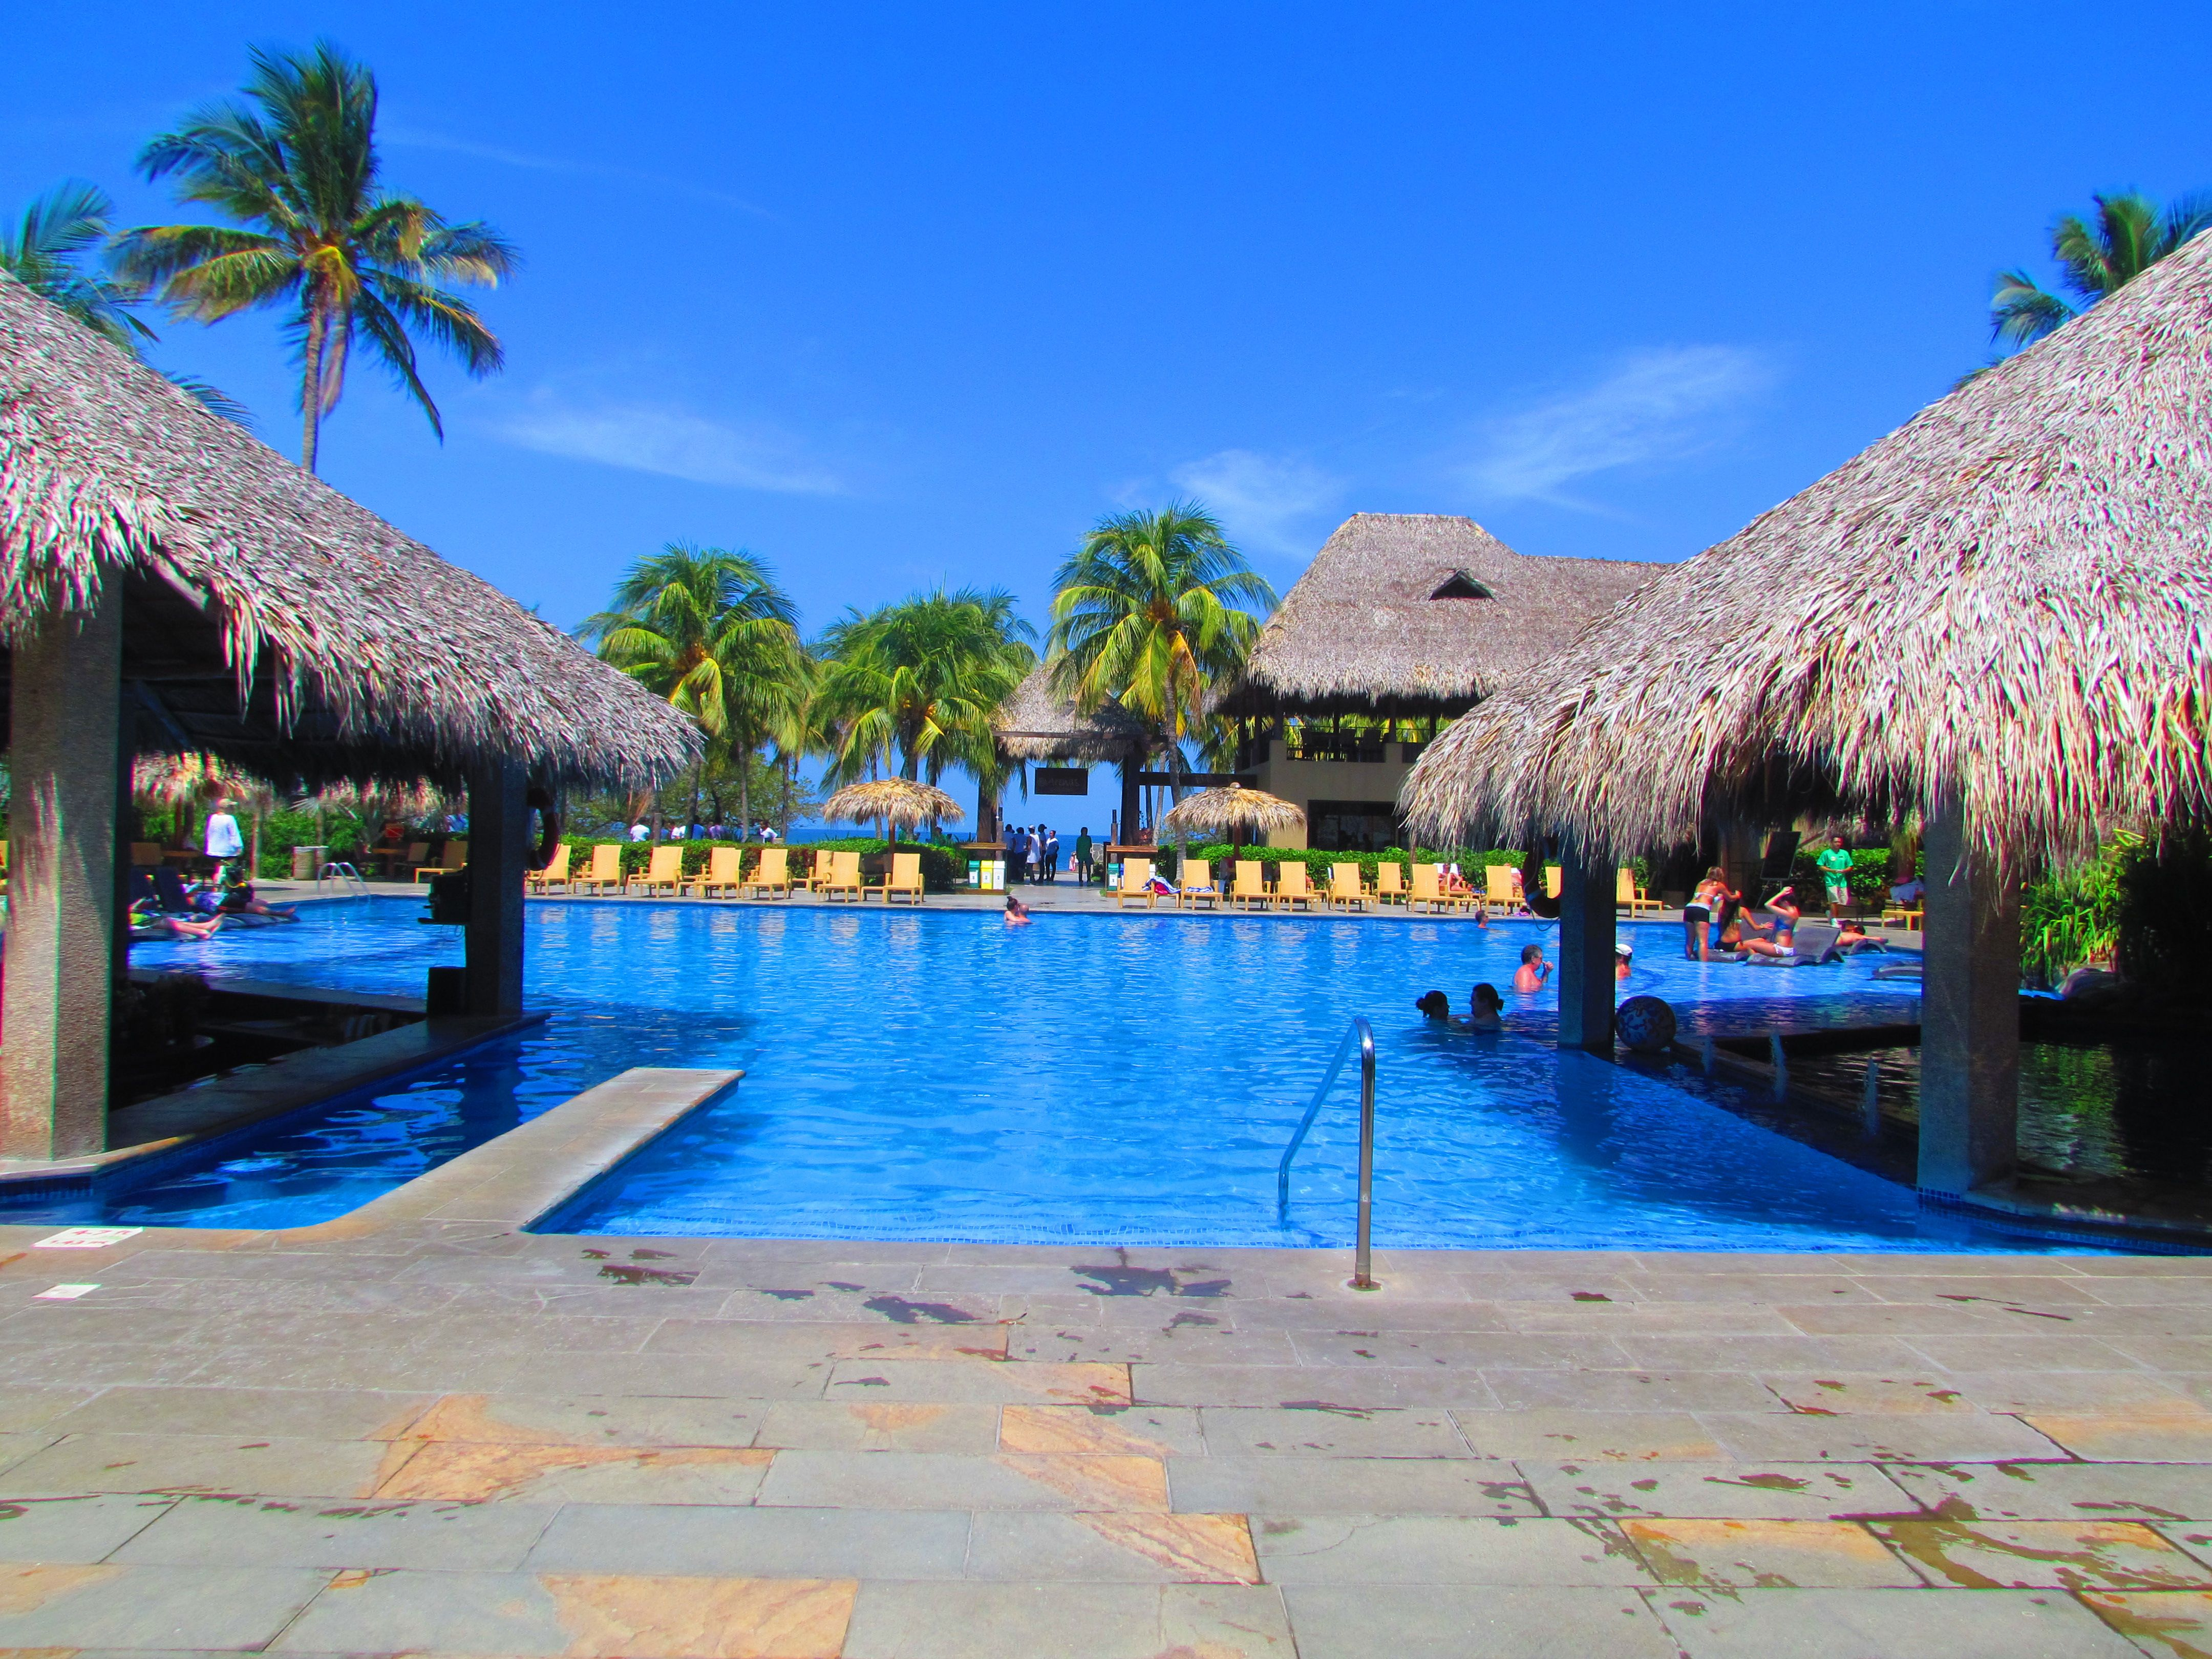 A Review Of Flamingo Beach Resort In Costa Rica Pura